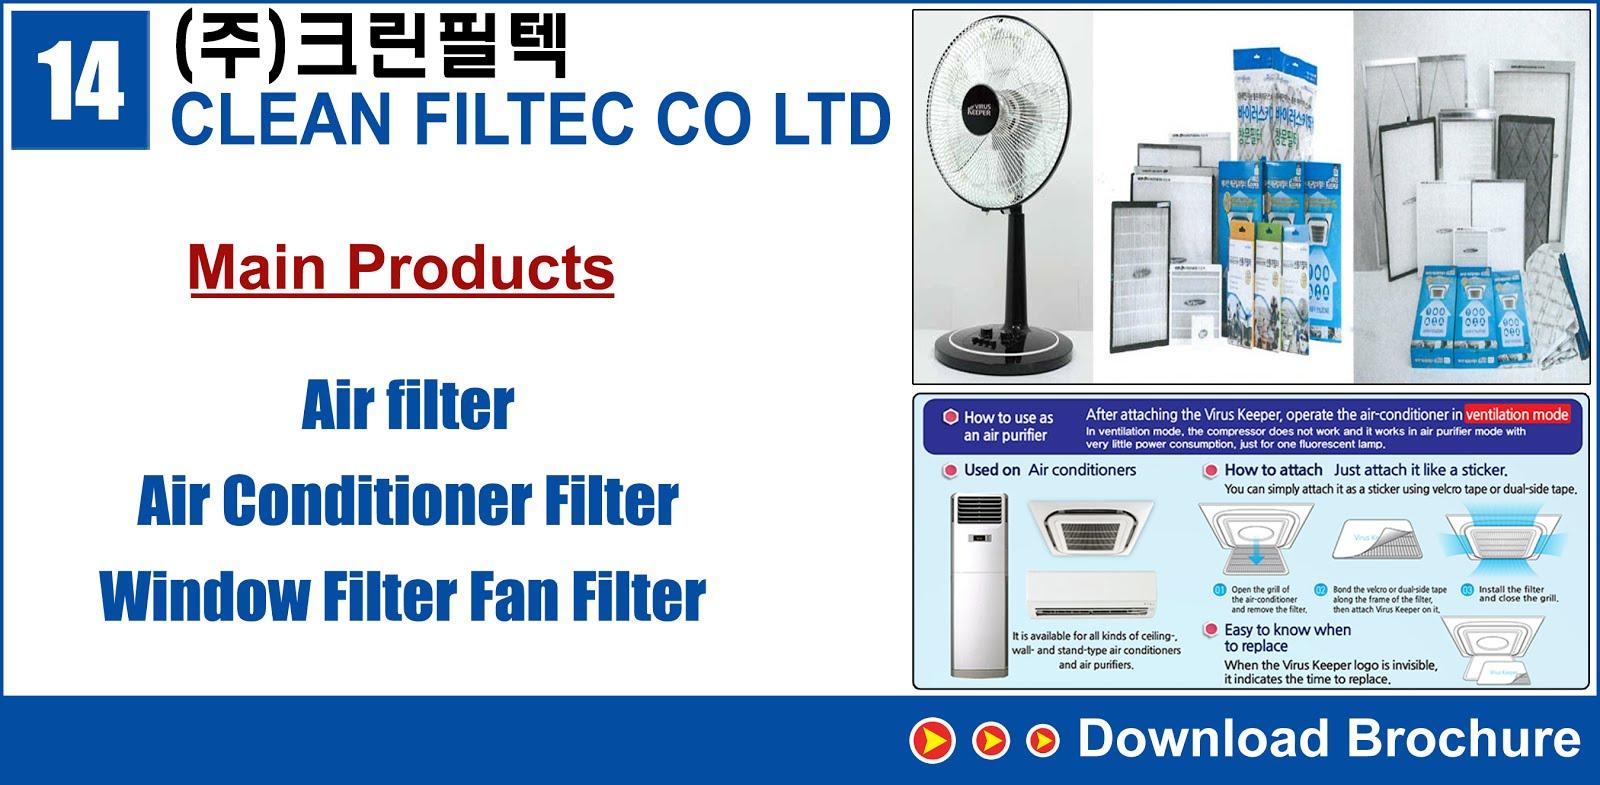 14.CLEAN FILTEC CO LTD